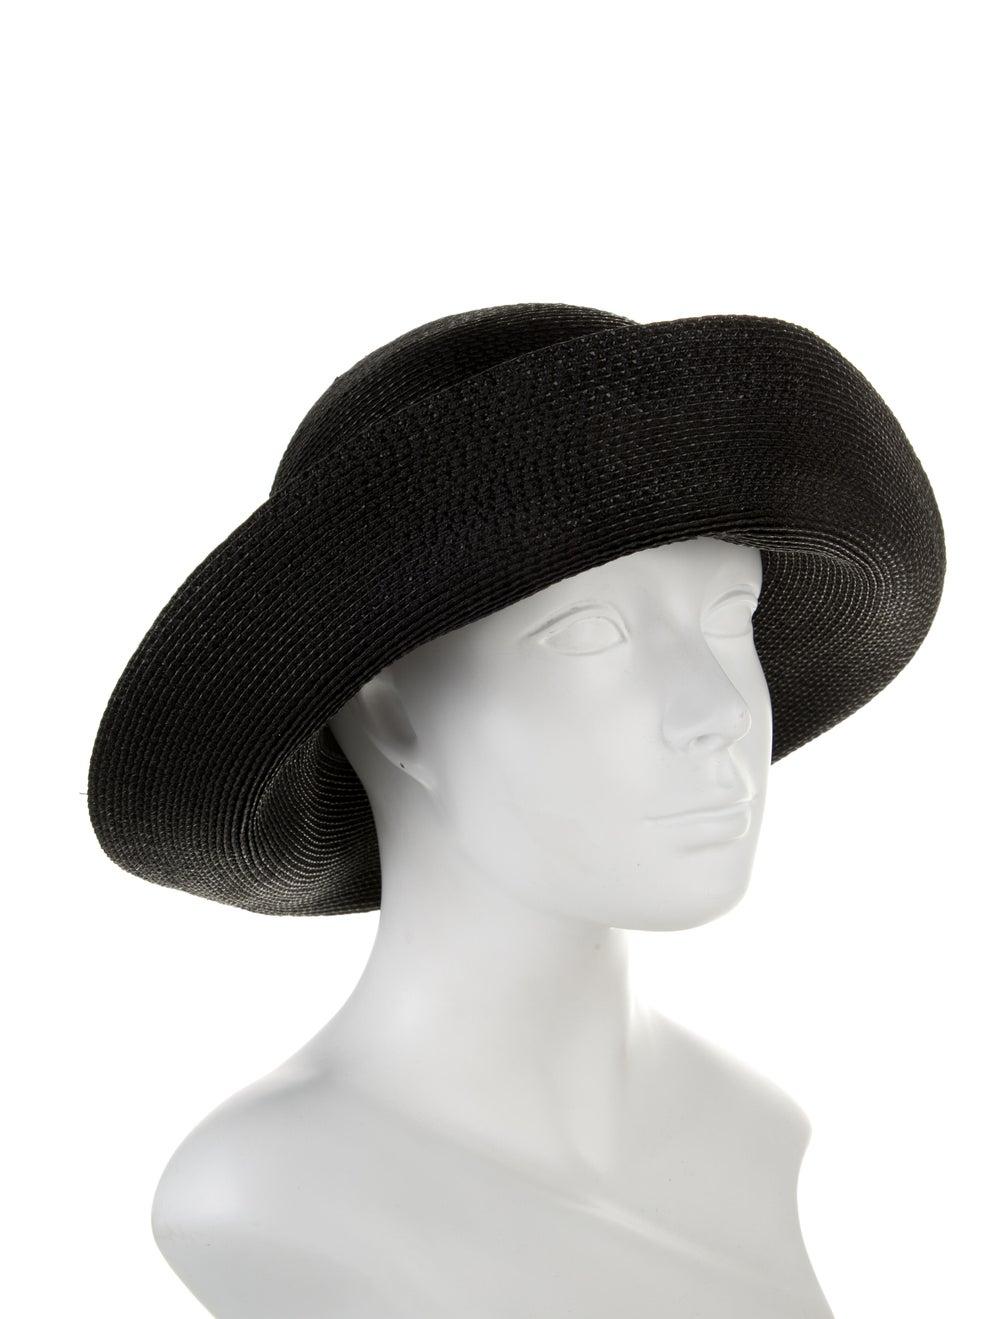 Patricia Underwood Black Straw Sun Hat Black - image 3